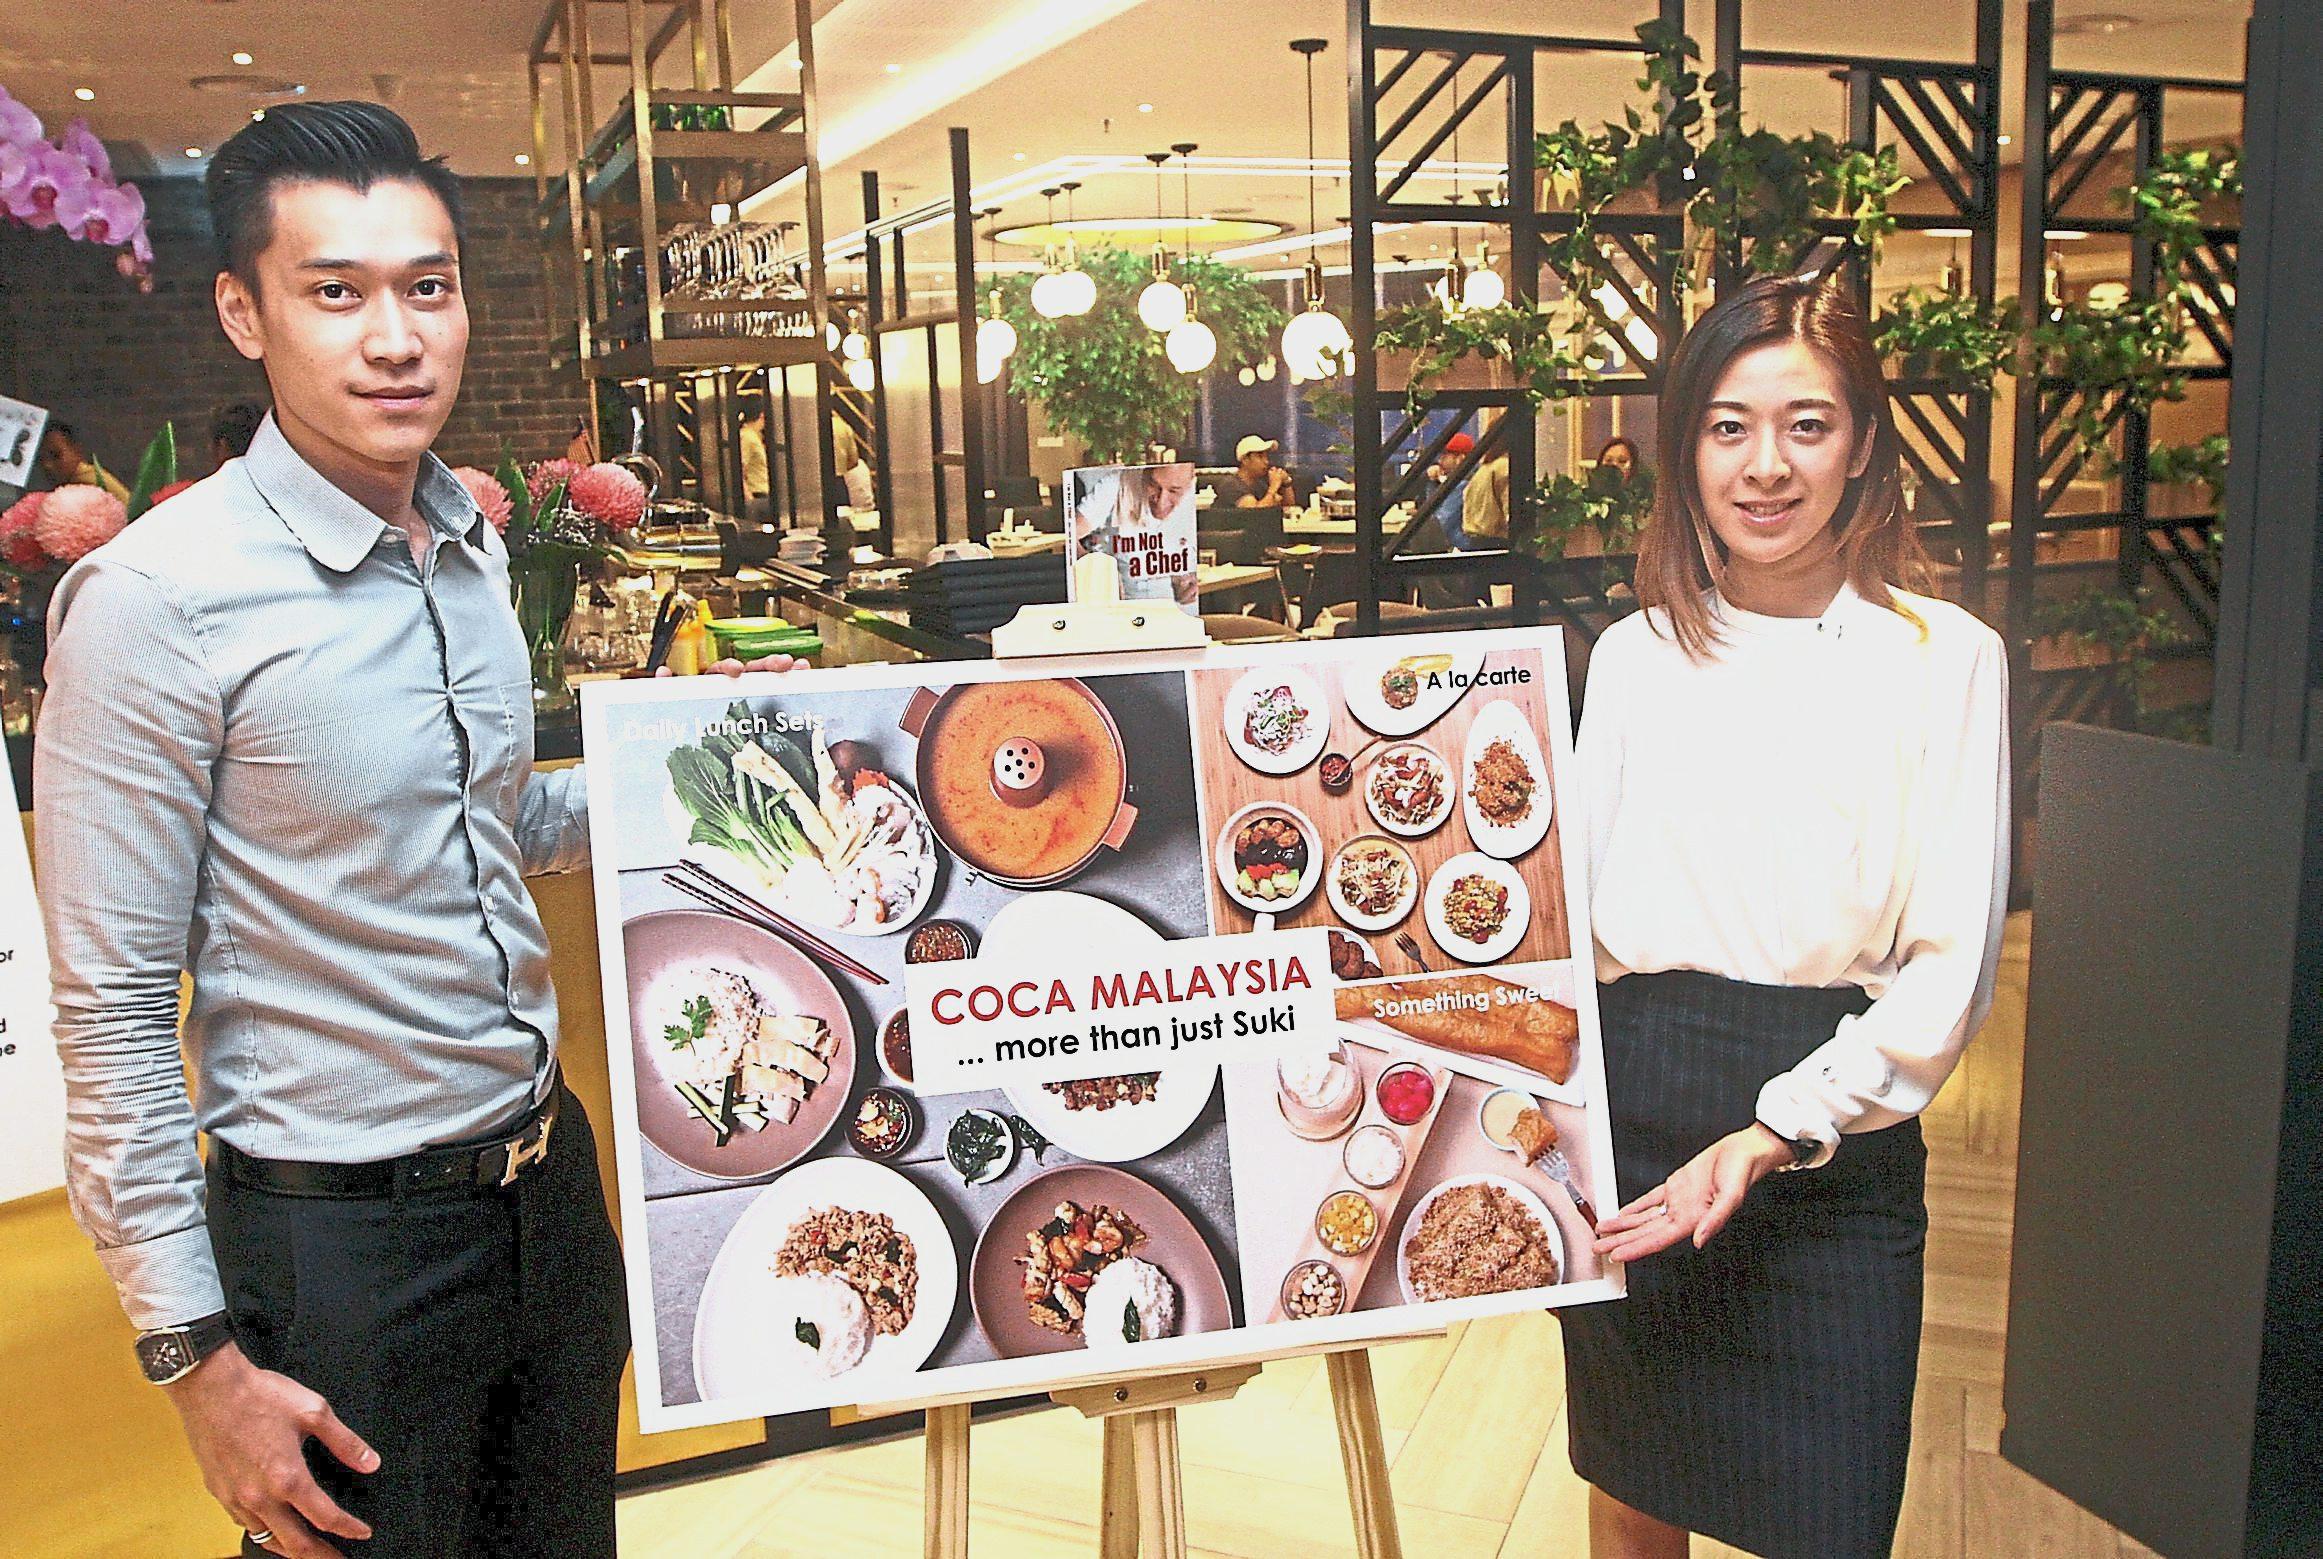 Coca Restaurant Kuala Lumpuru2019s owners Shun and Lee.